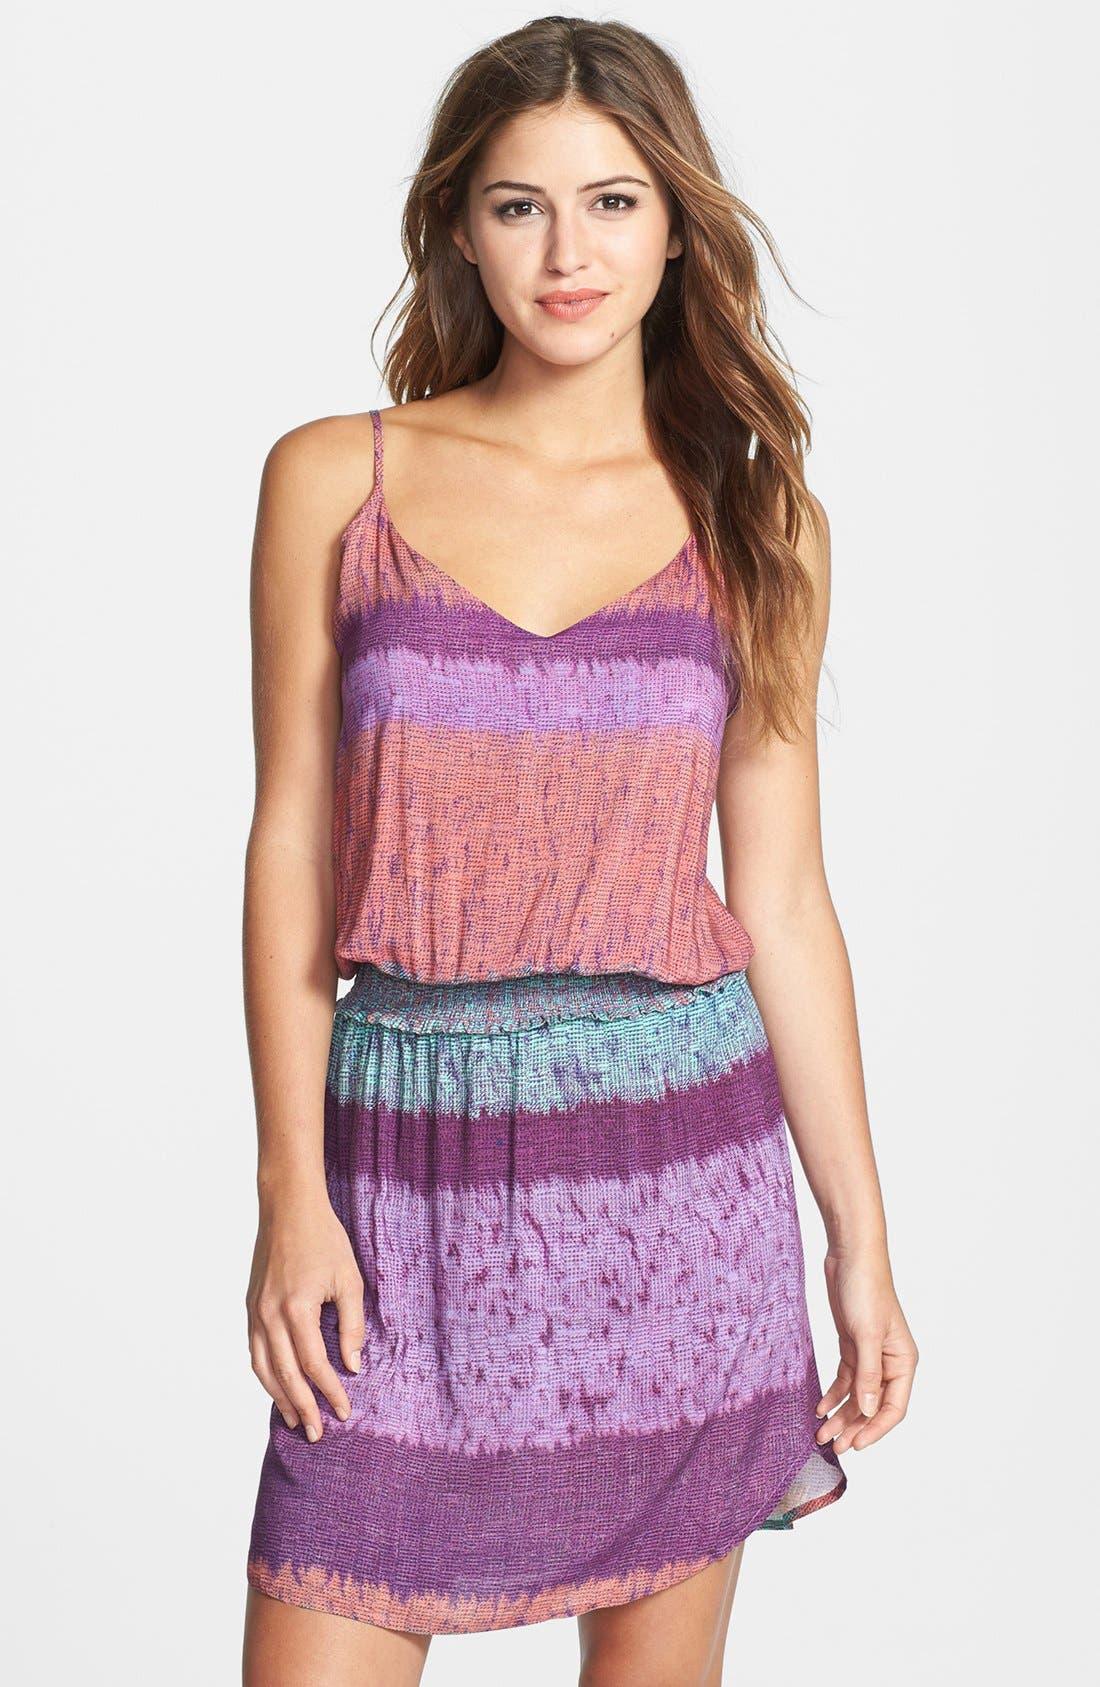 Main Image - ViX Swimwear 'Acai Zoe' Cover-Up Dress